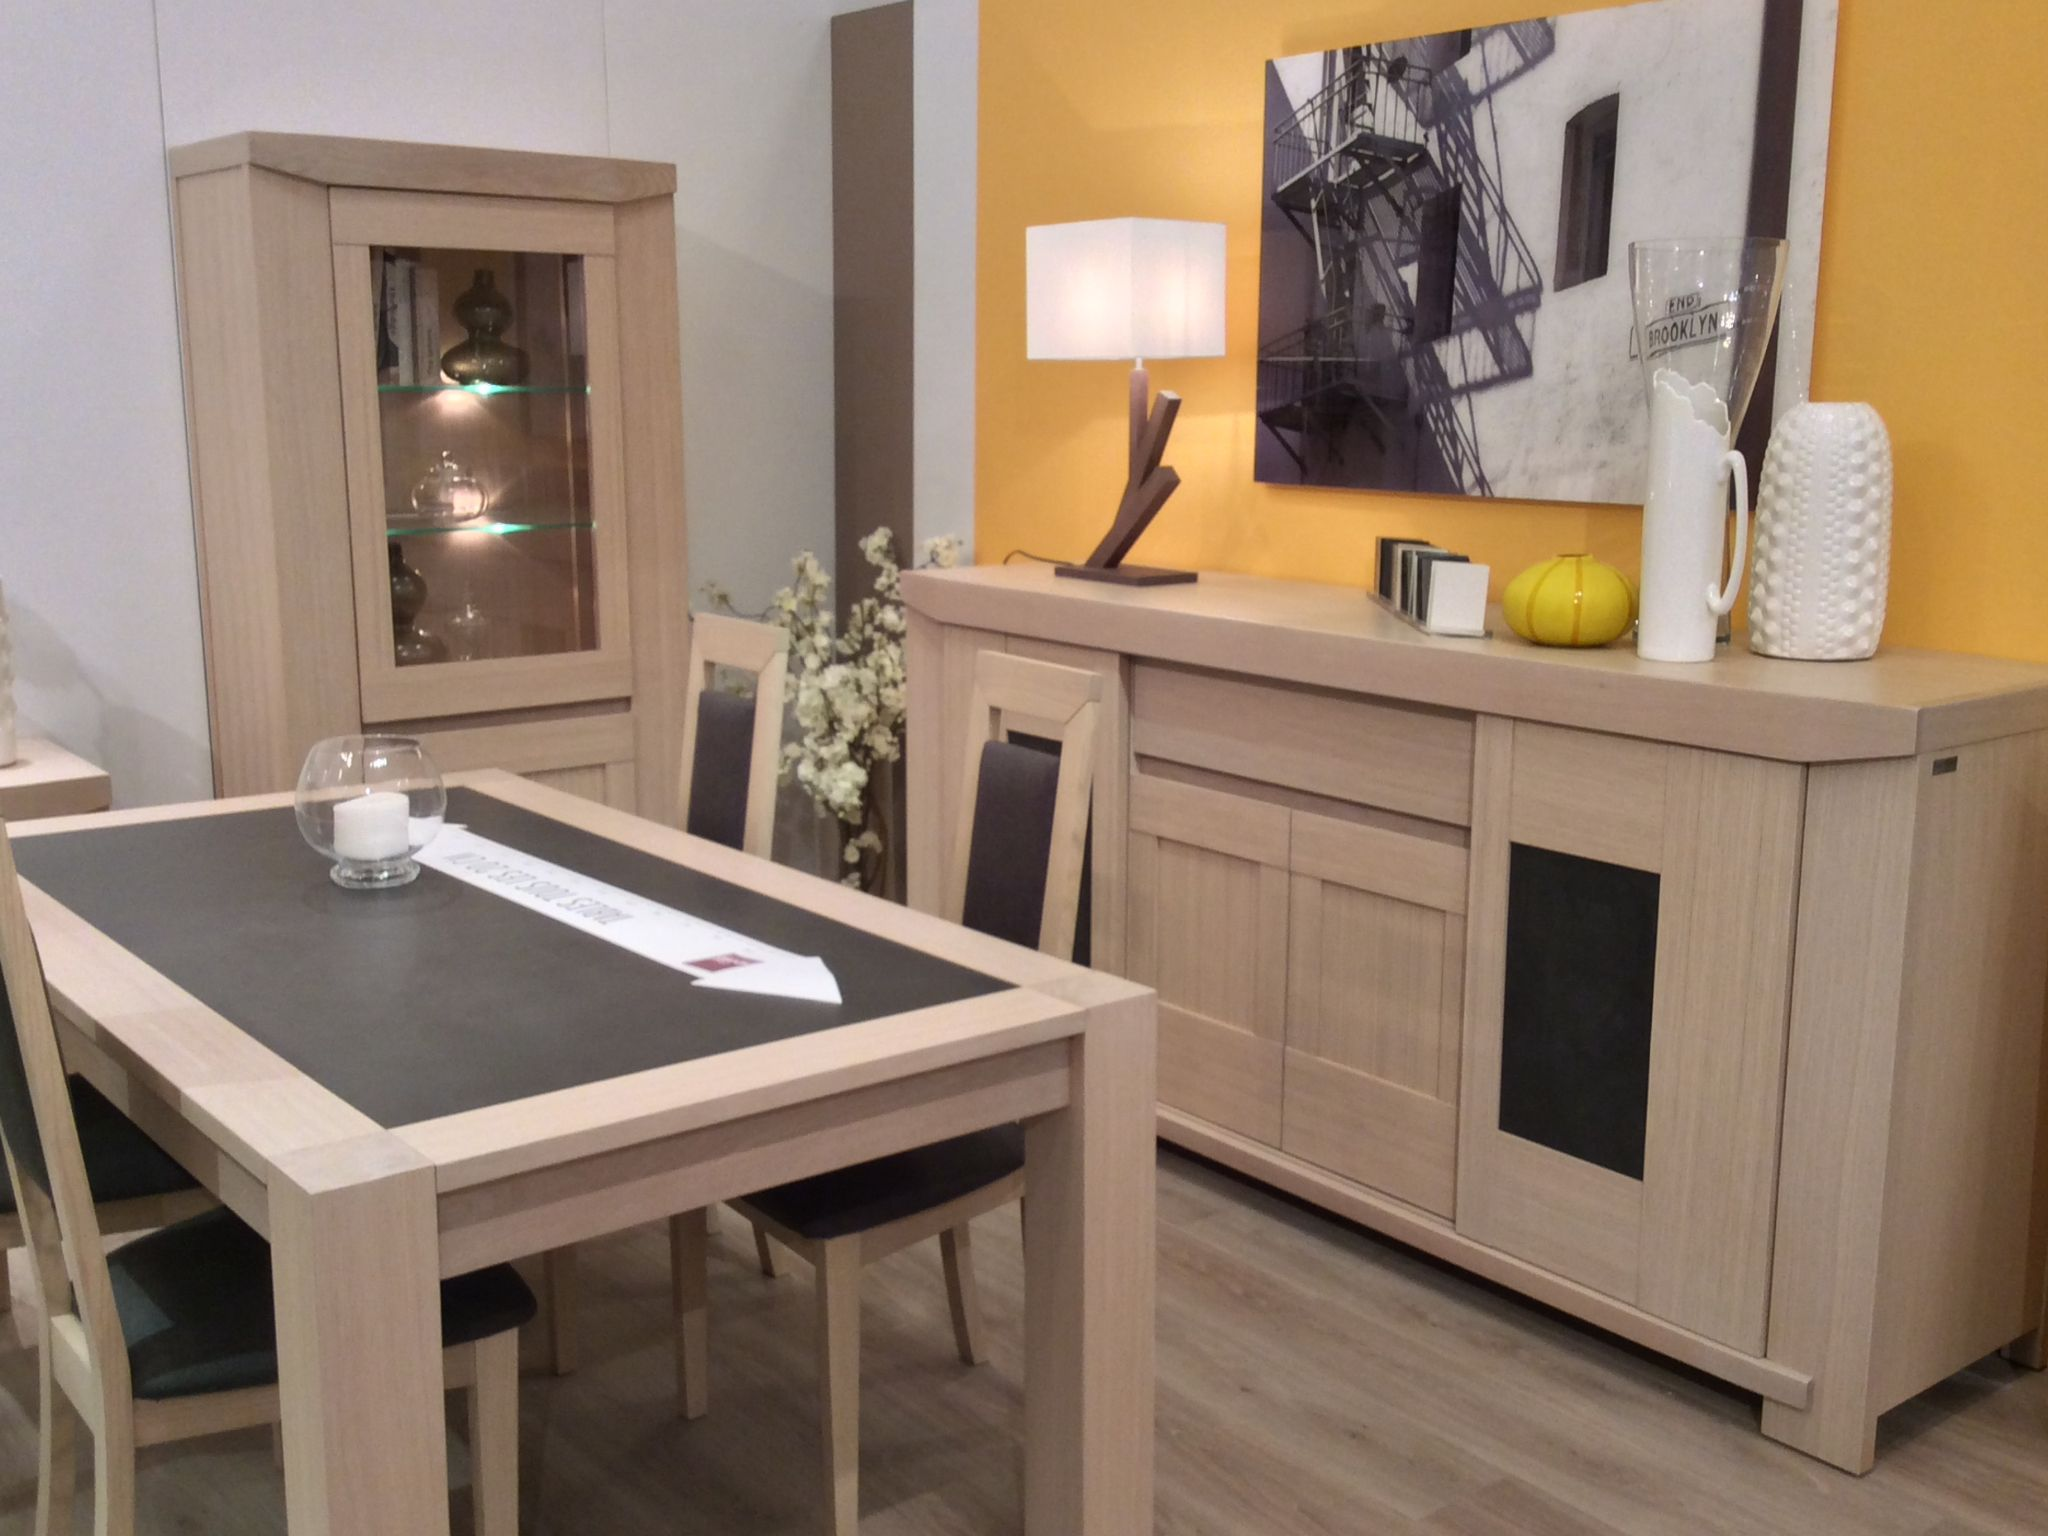 Colorado meubles ernest m nard fabriqu en france ernest des meubles n s en bretagne - Meuble ernest menard occasion ...